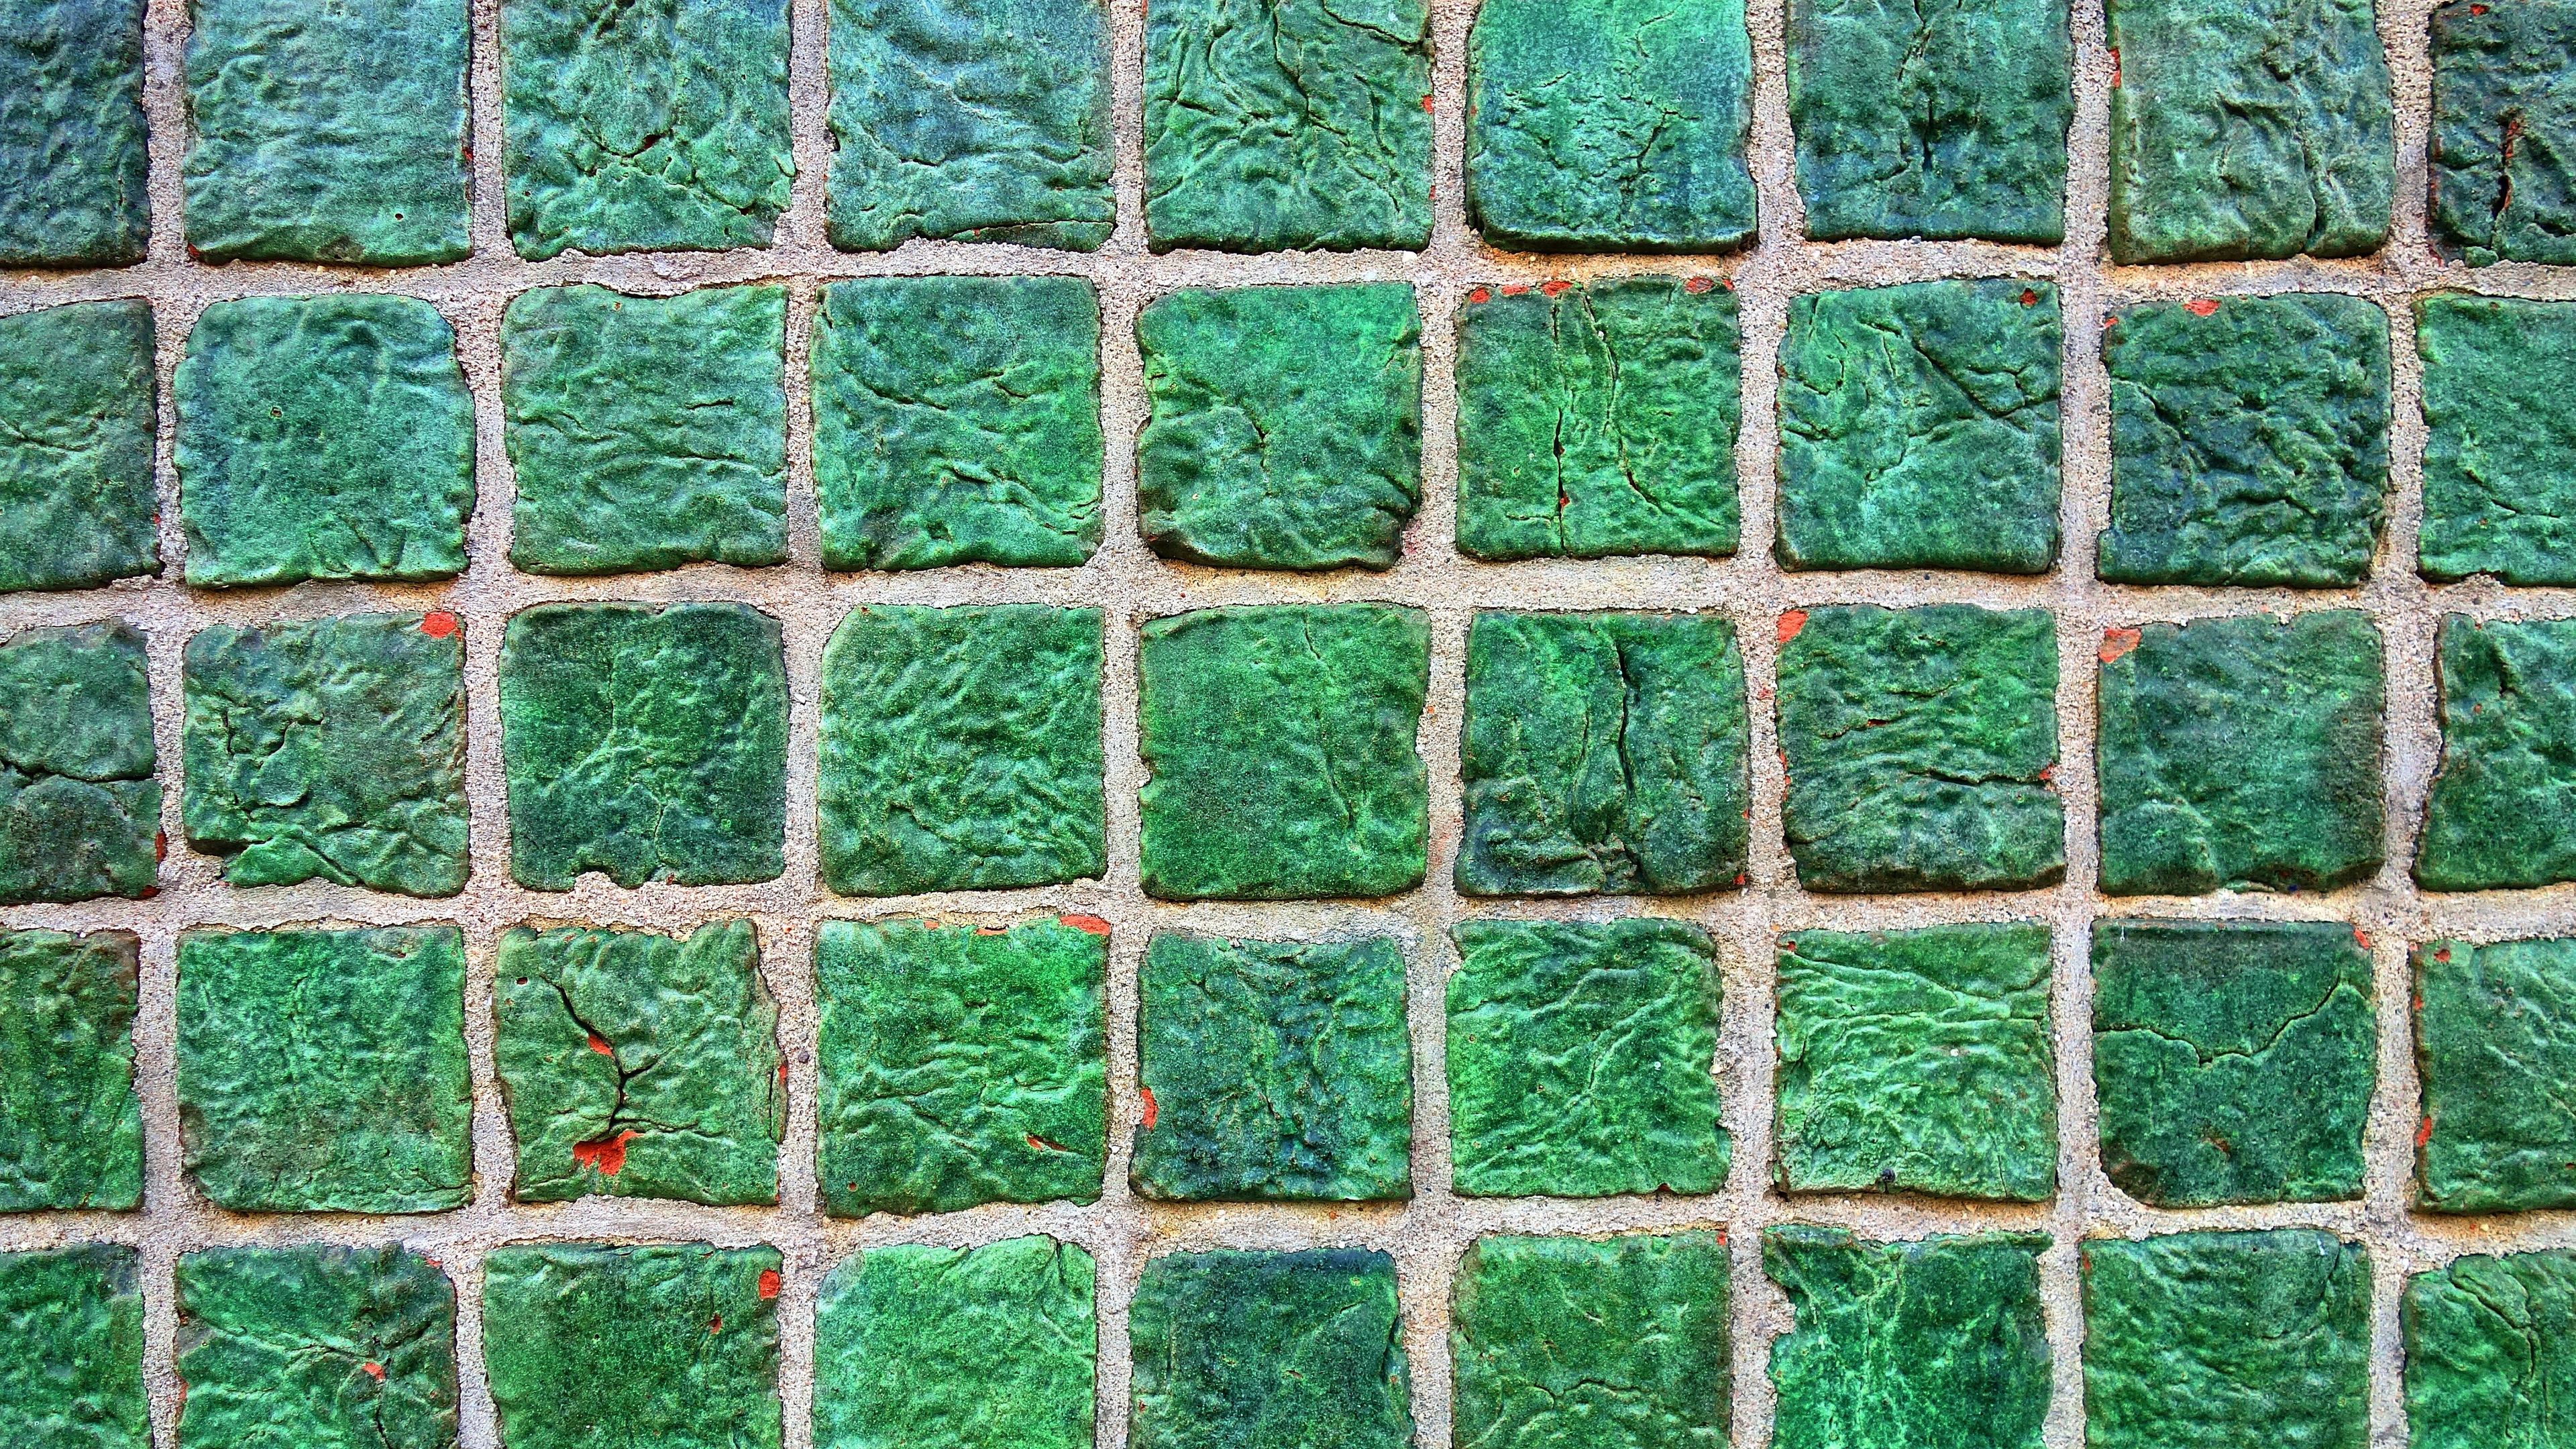 texture surface tile tiles 4k 1536097727 - texture, surface, tile, tiles 4k - tile, Texture, Surface